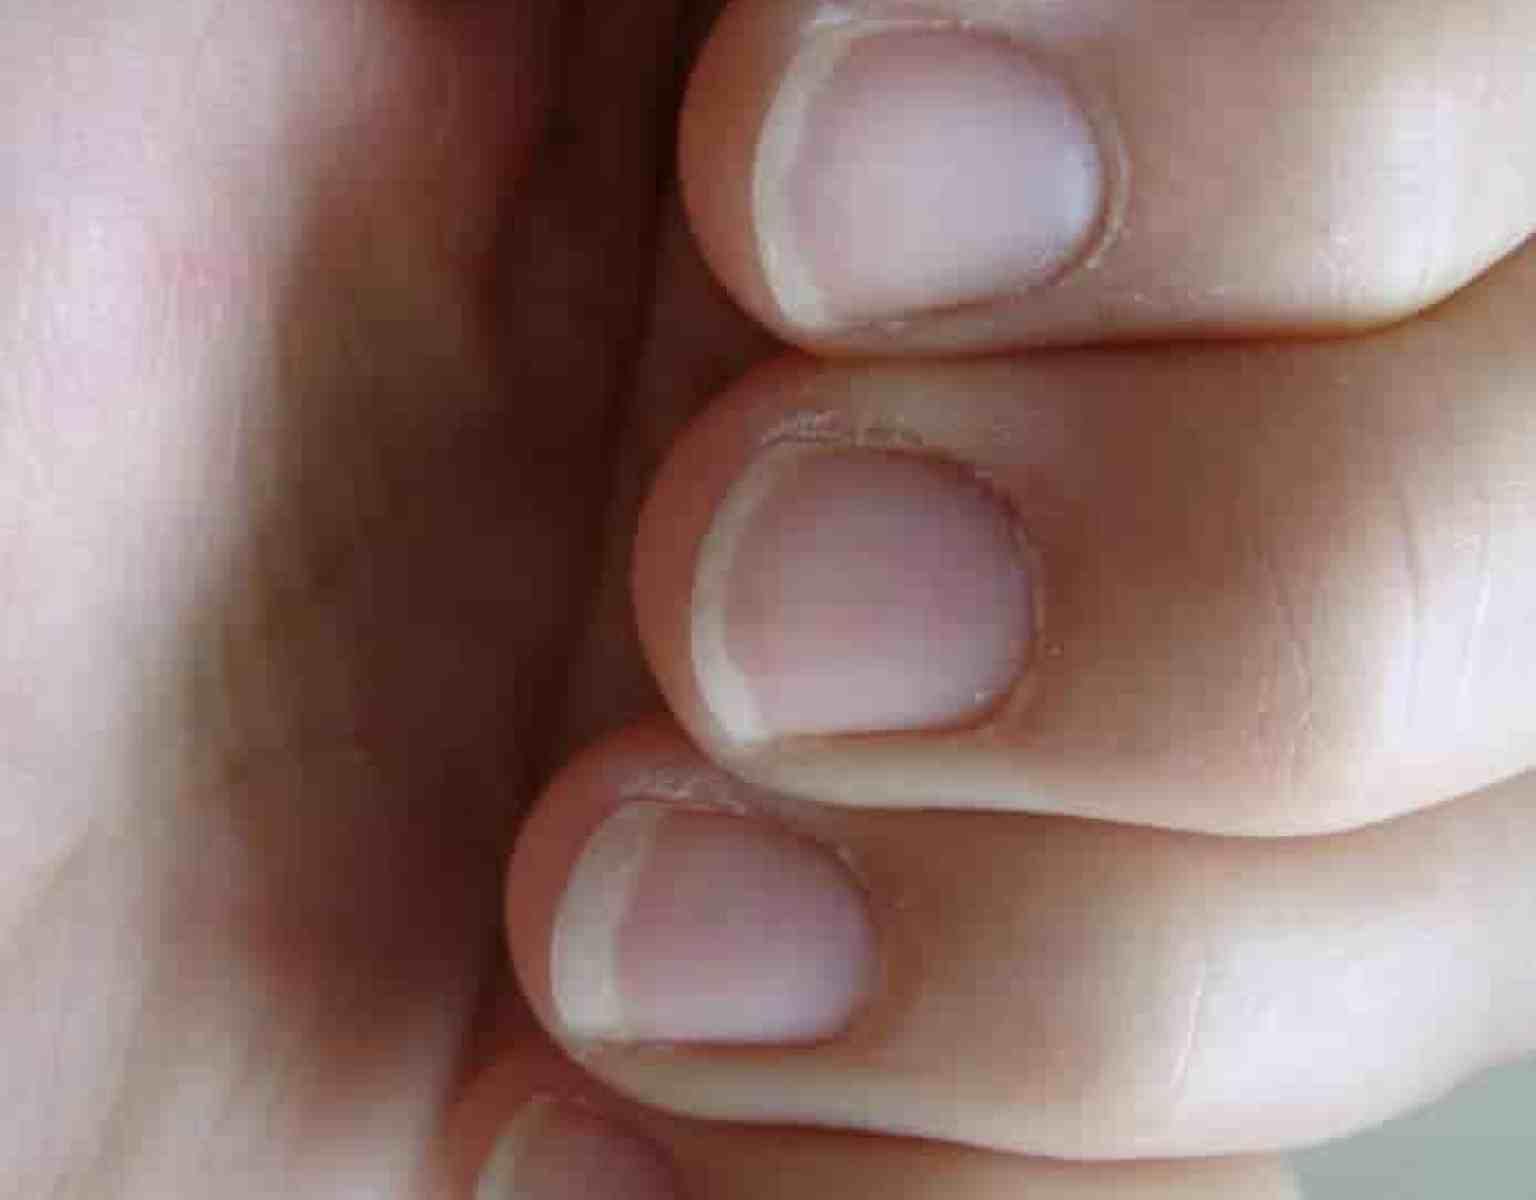 88+ Fingernail Health Ridges - Thick Fingernail Ridge Has Grown Out ...